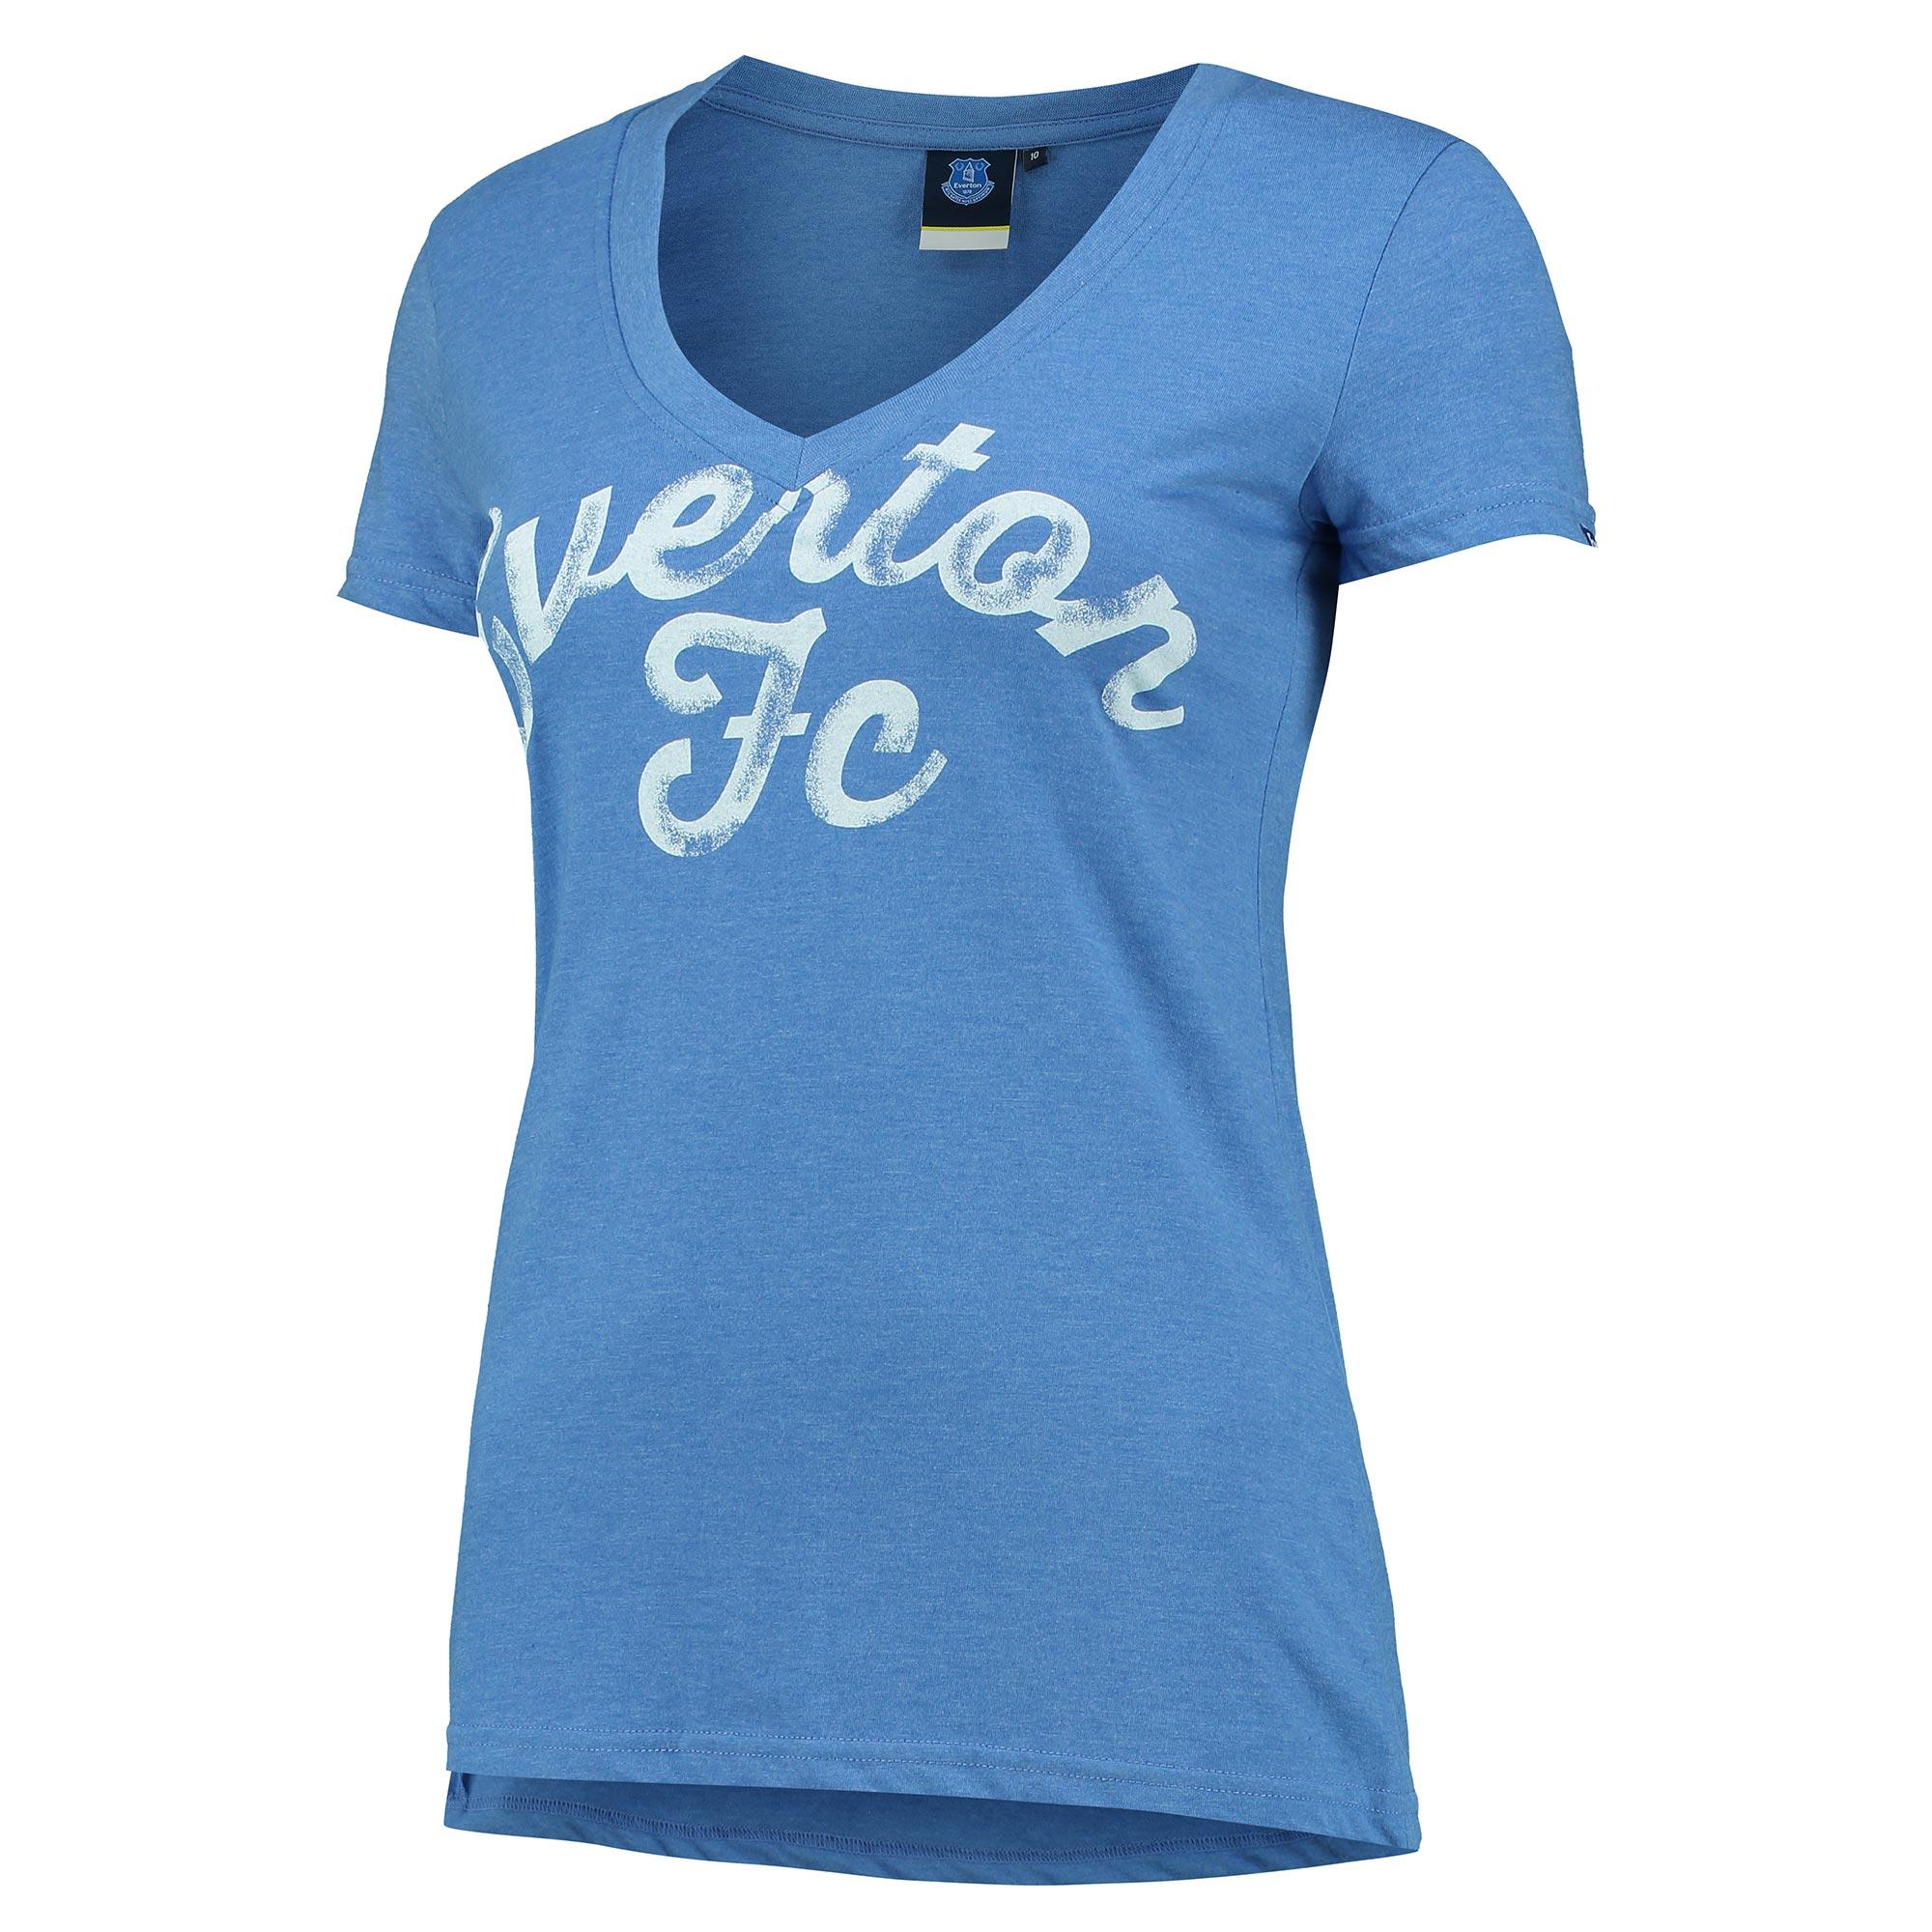 Everton V-Neck T-Shirt - Royal - Womens